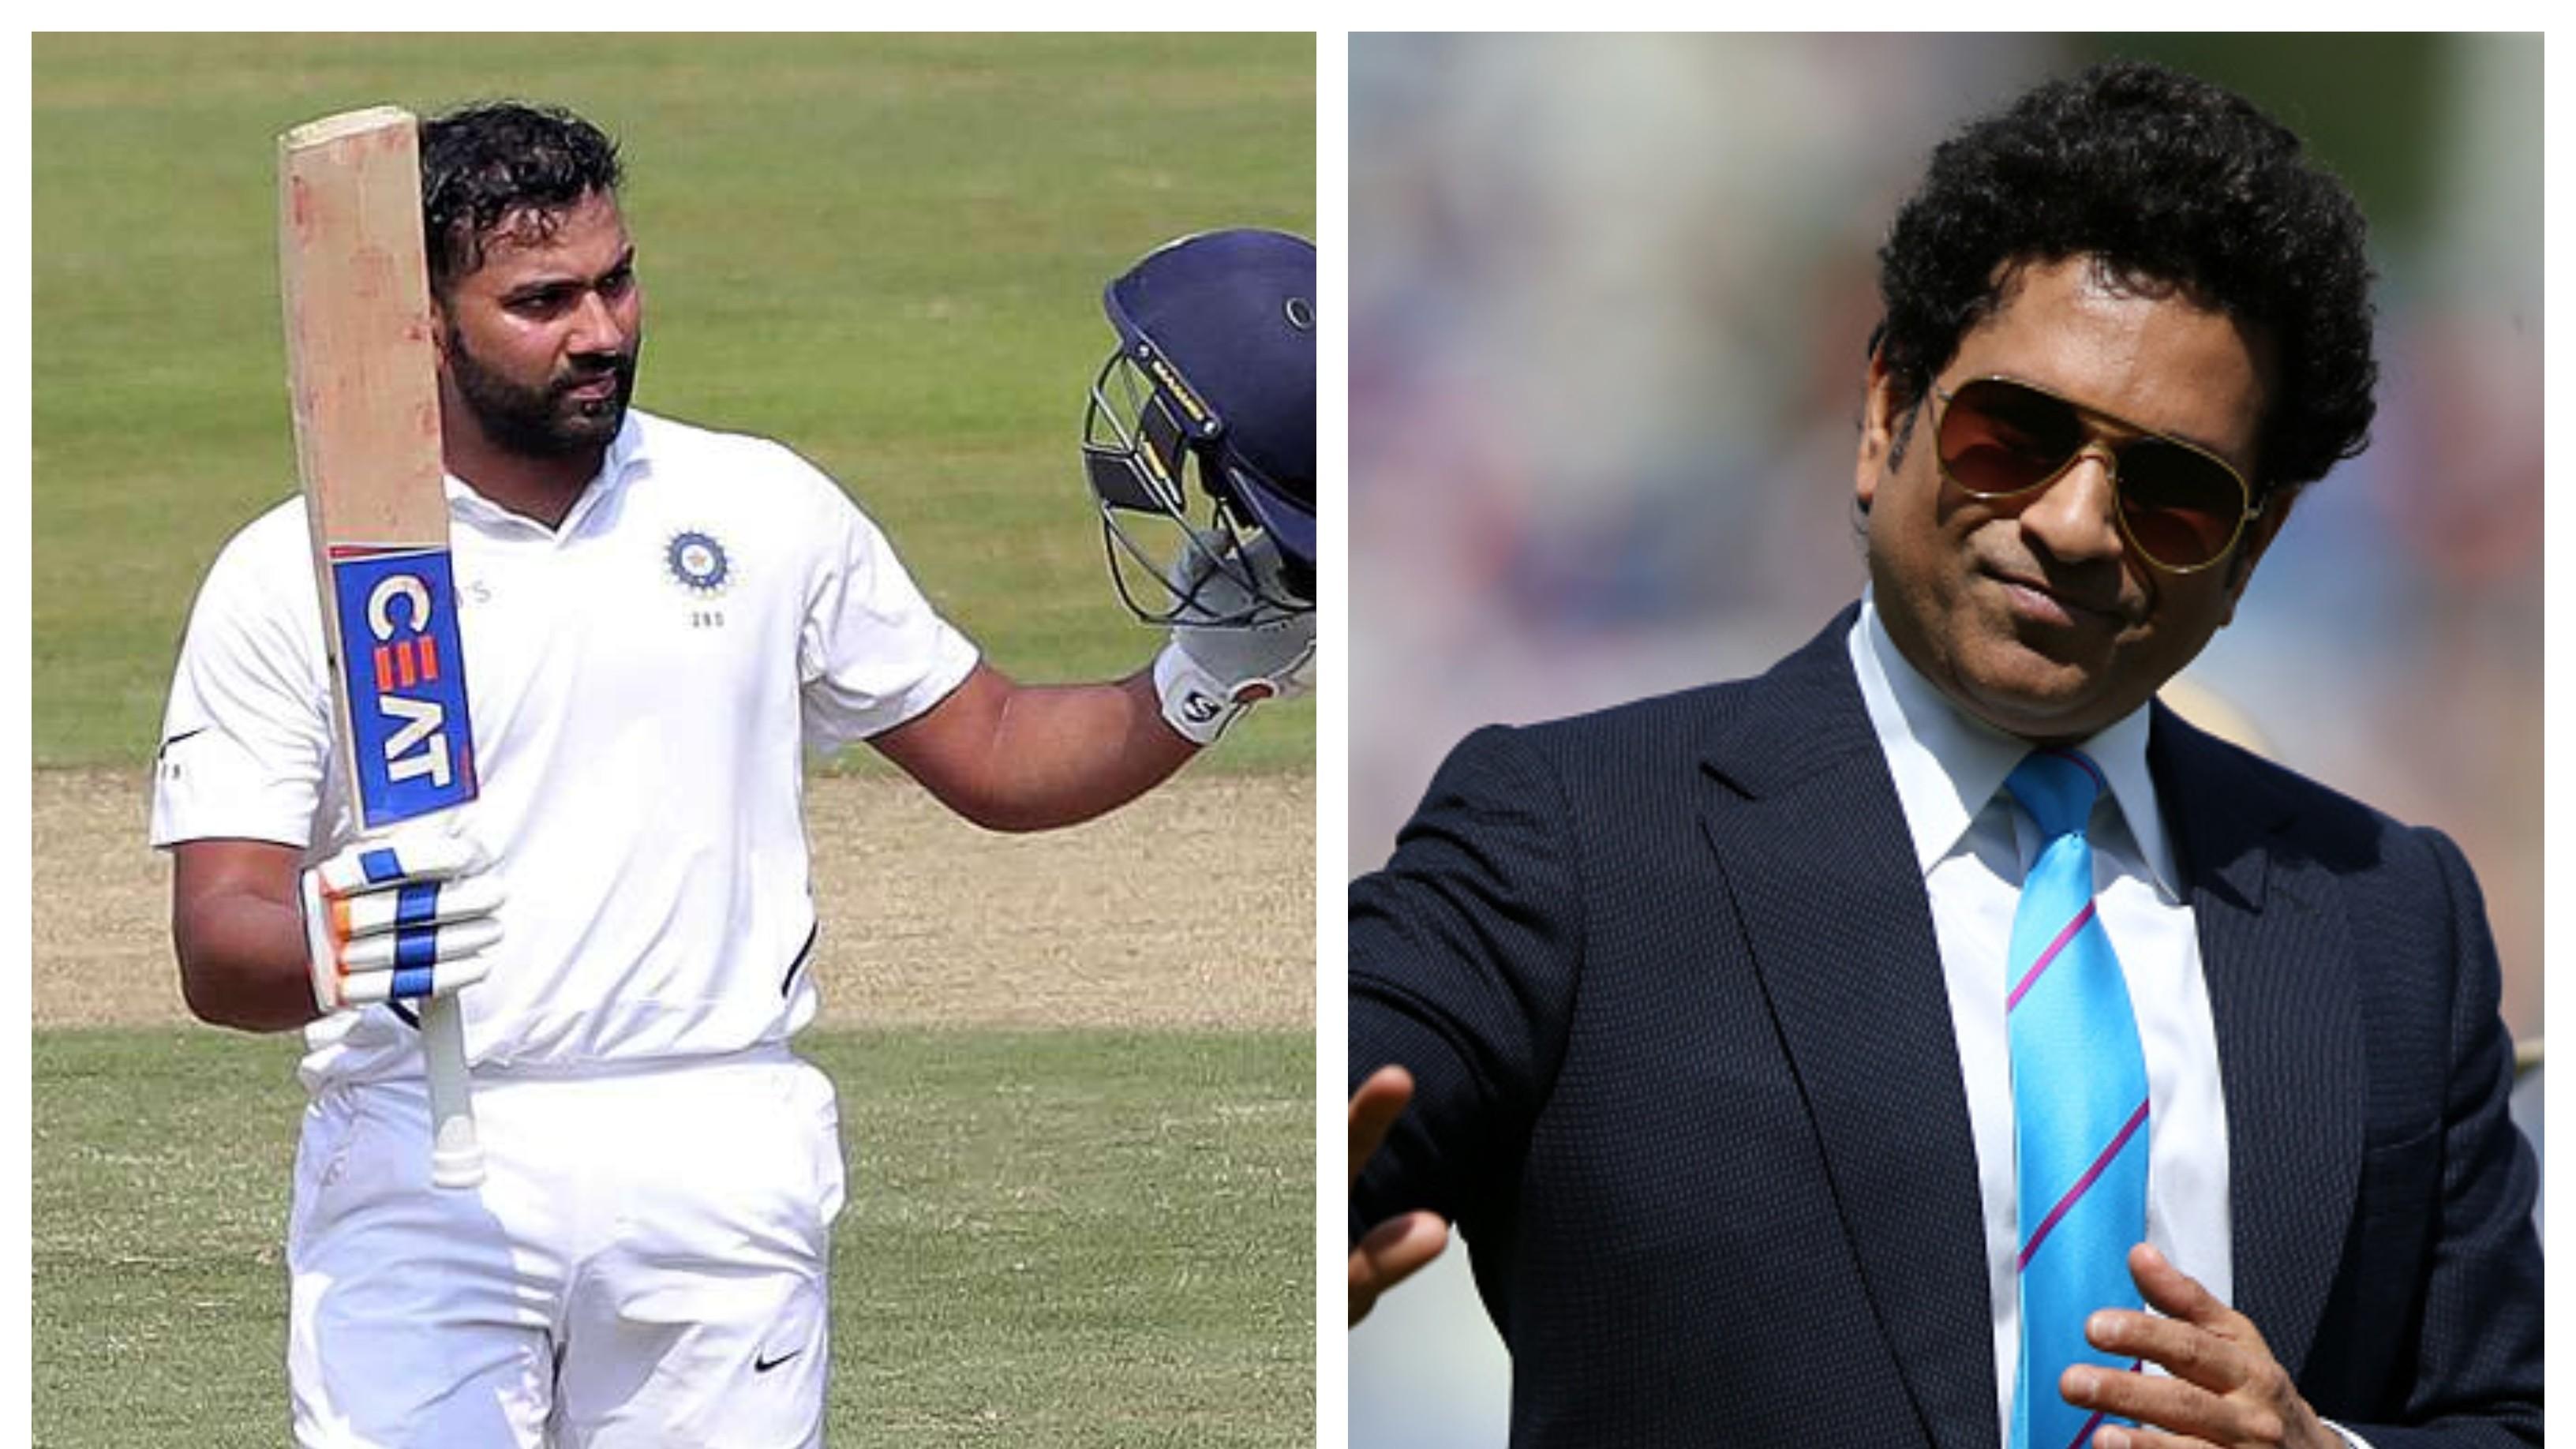 IND v SA 2019: Sachin Tendulkar heaps praise on Rohit Sharma after Visakhapatnam Test ton